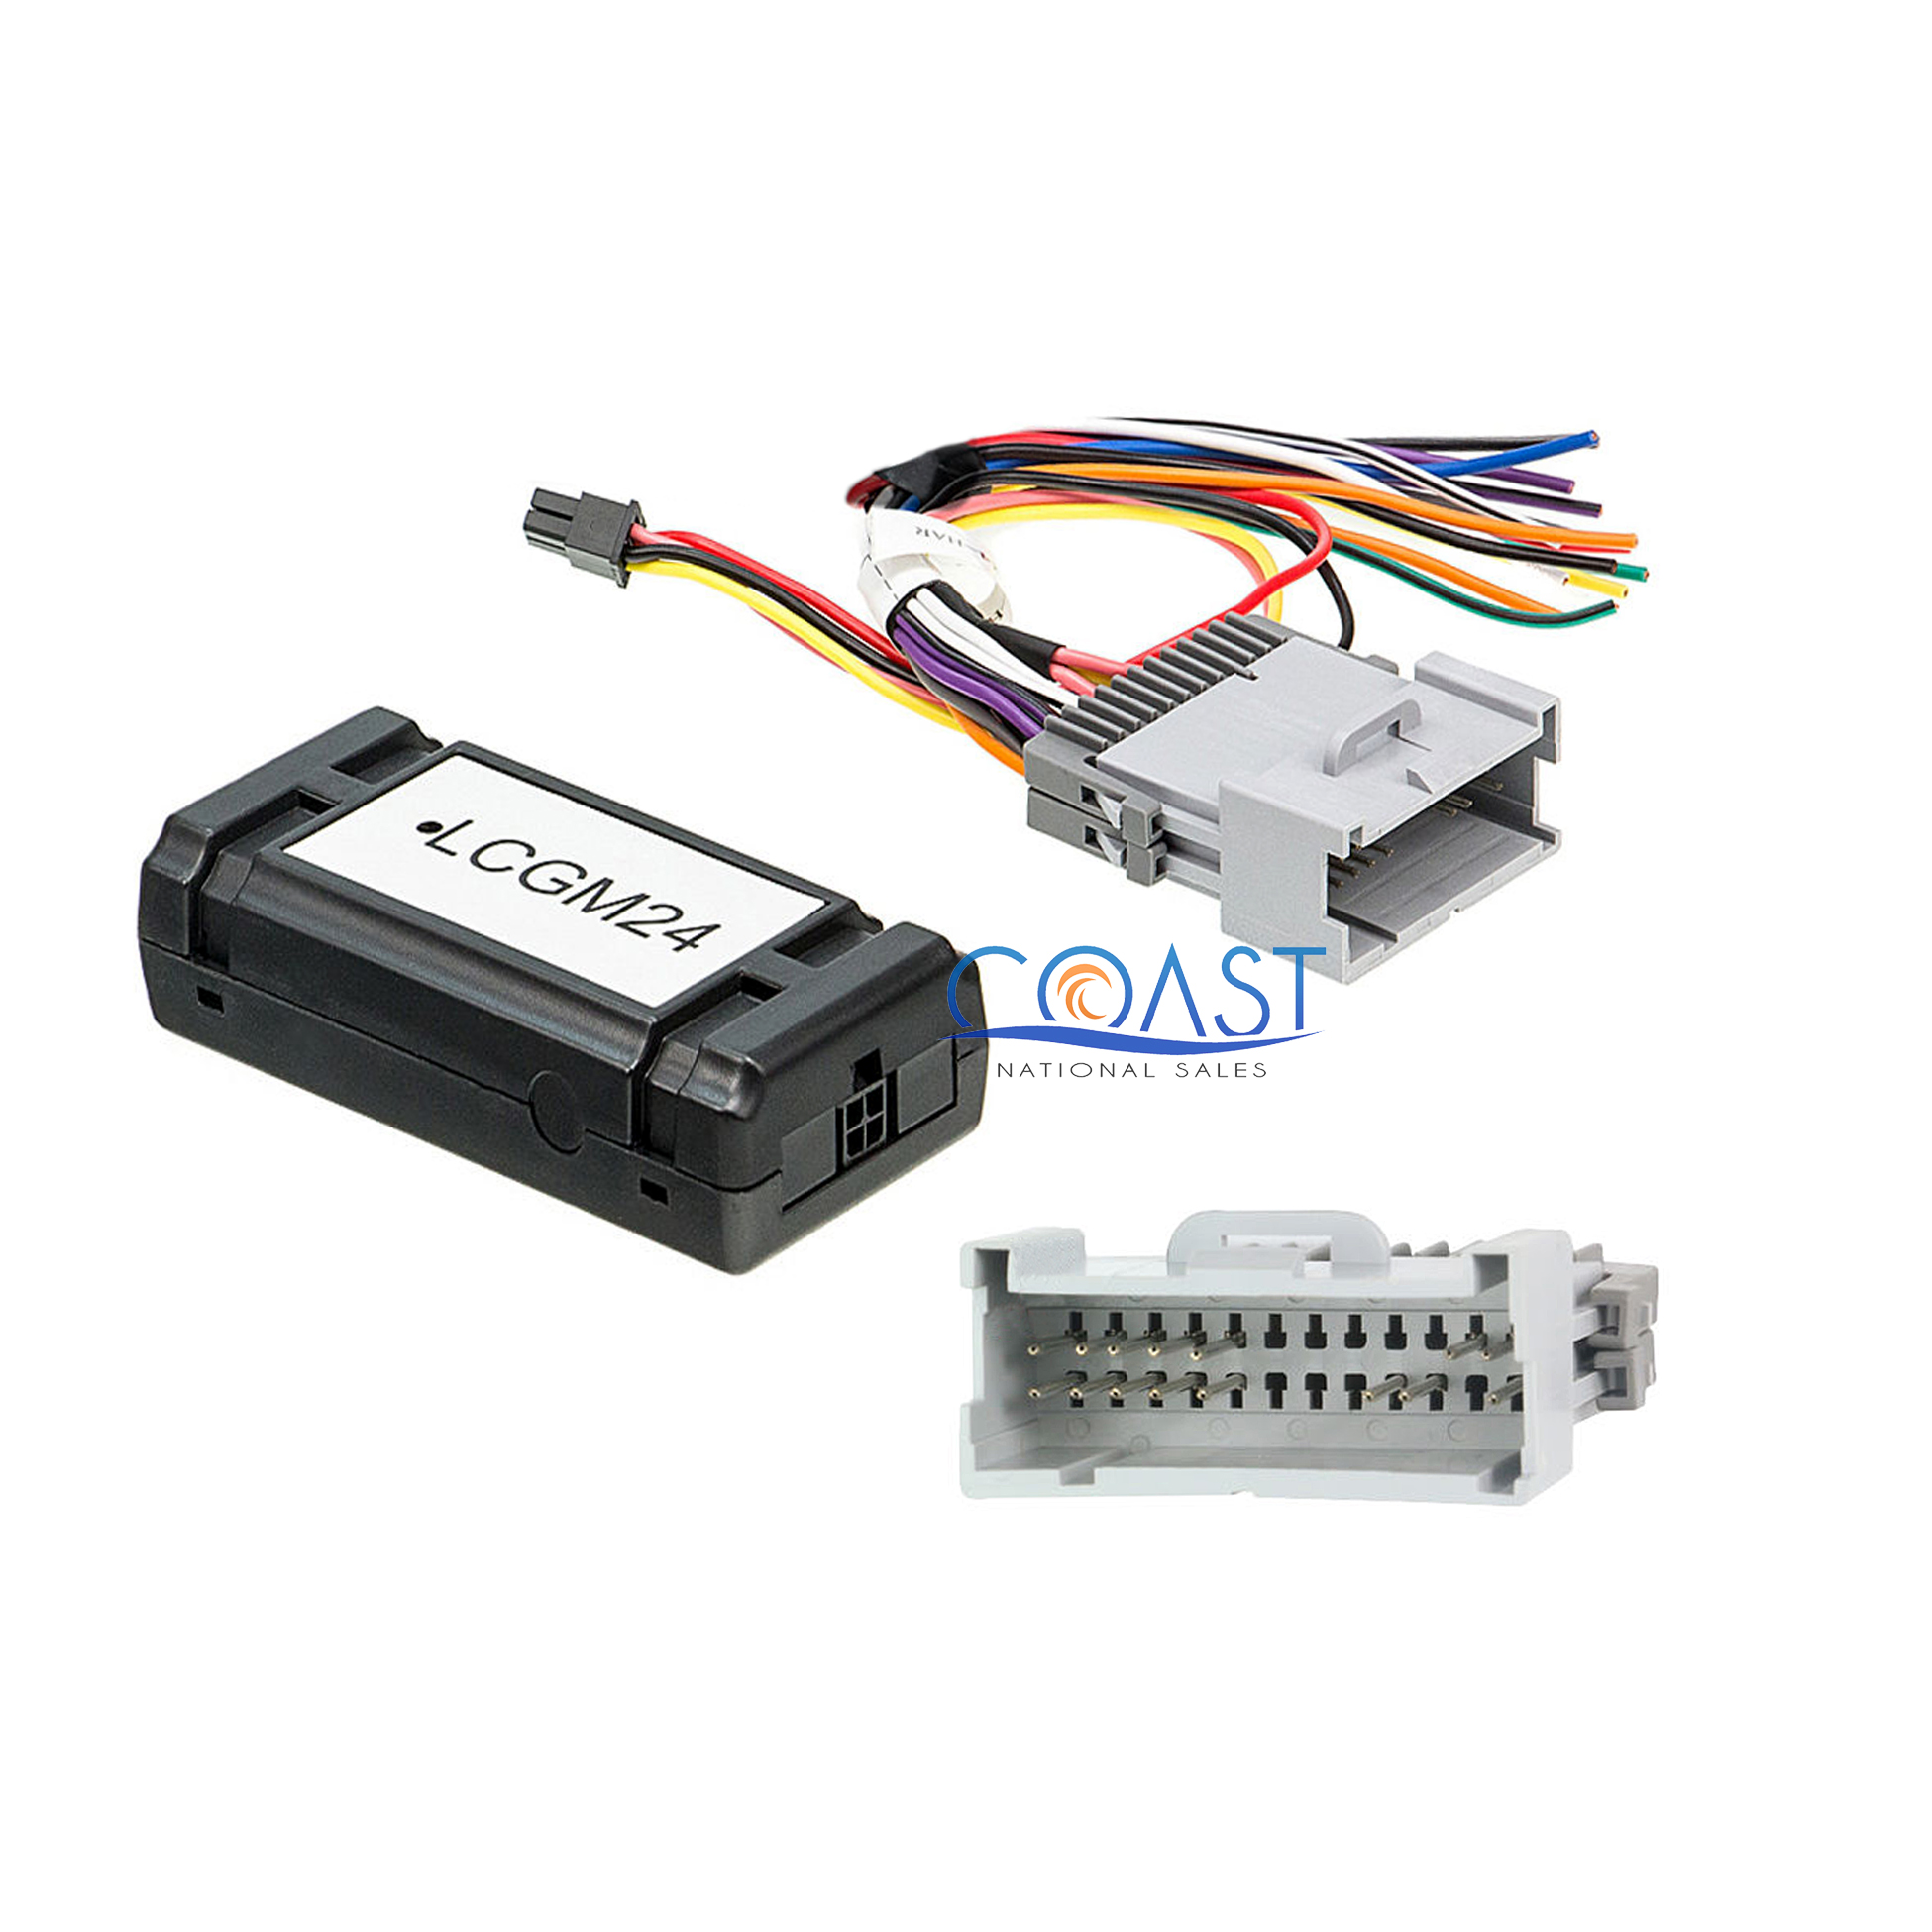 Car Audio Gm General Motor Radio Interface Harness For 2000 Up Base 2006 Malibu Ltz Wiring Model Only